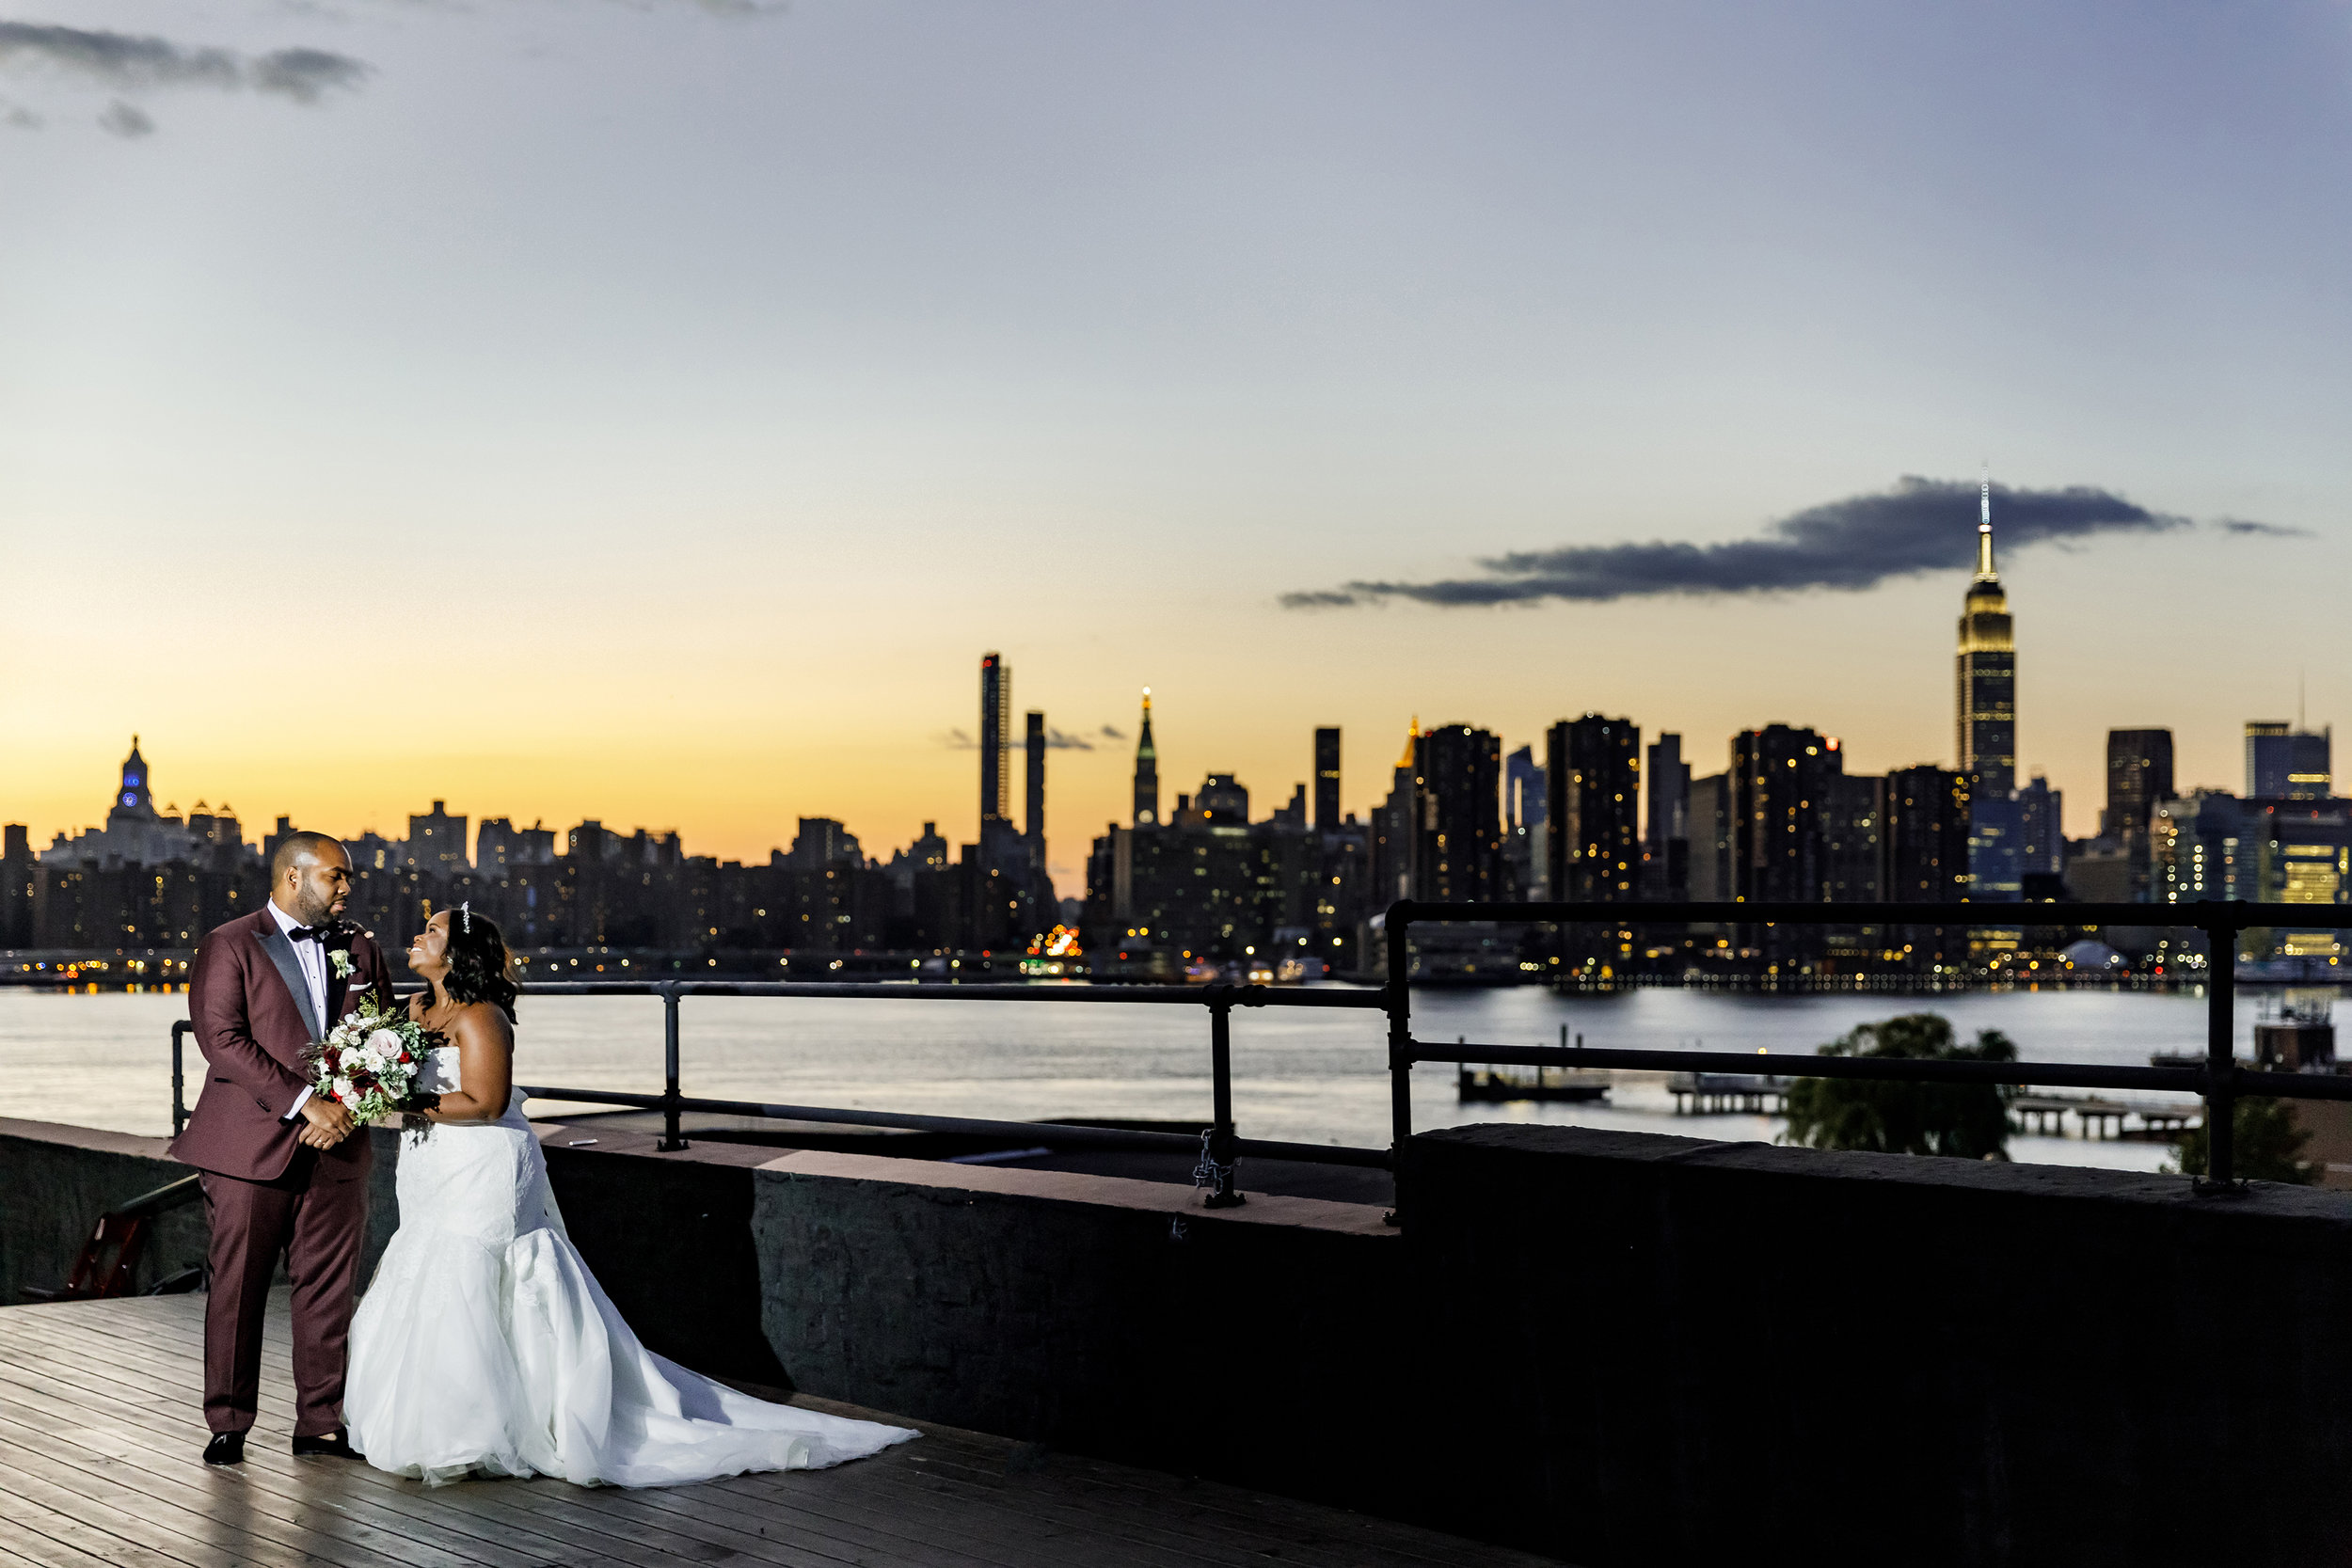 victorious-events-nyc-033-yanique-rondel-greenpoint-loft-wedding-amy-anaiz.jpg